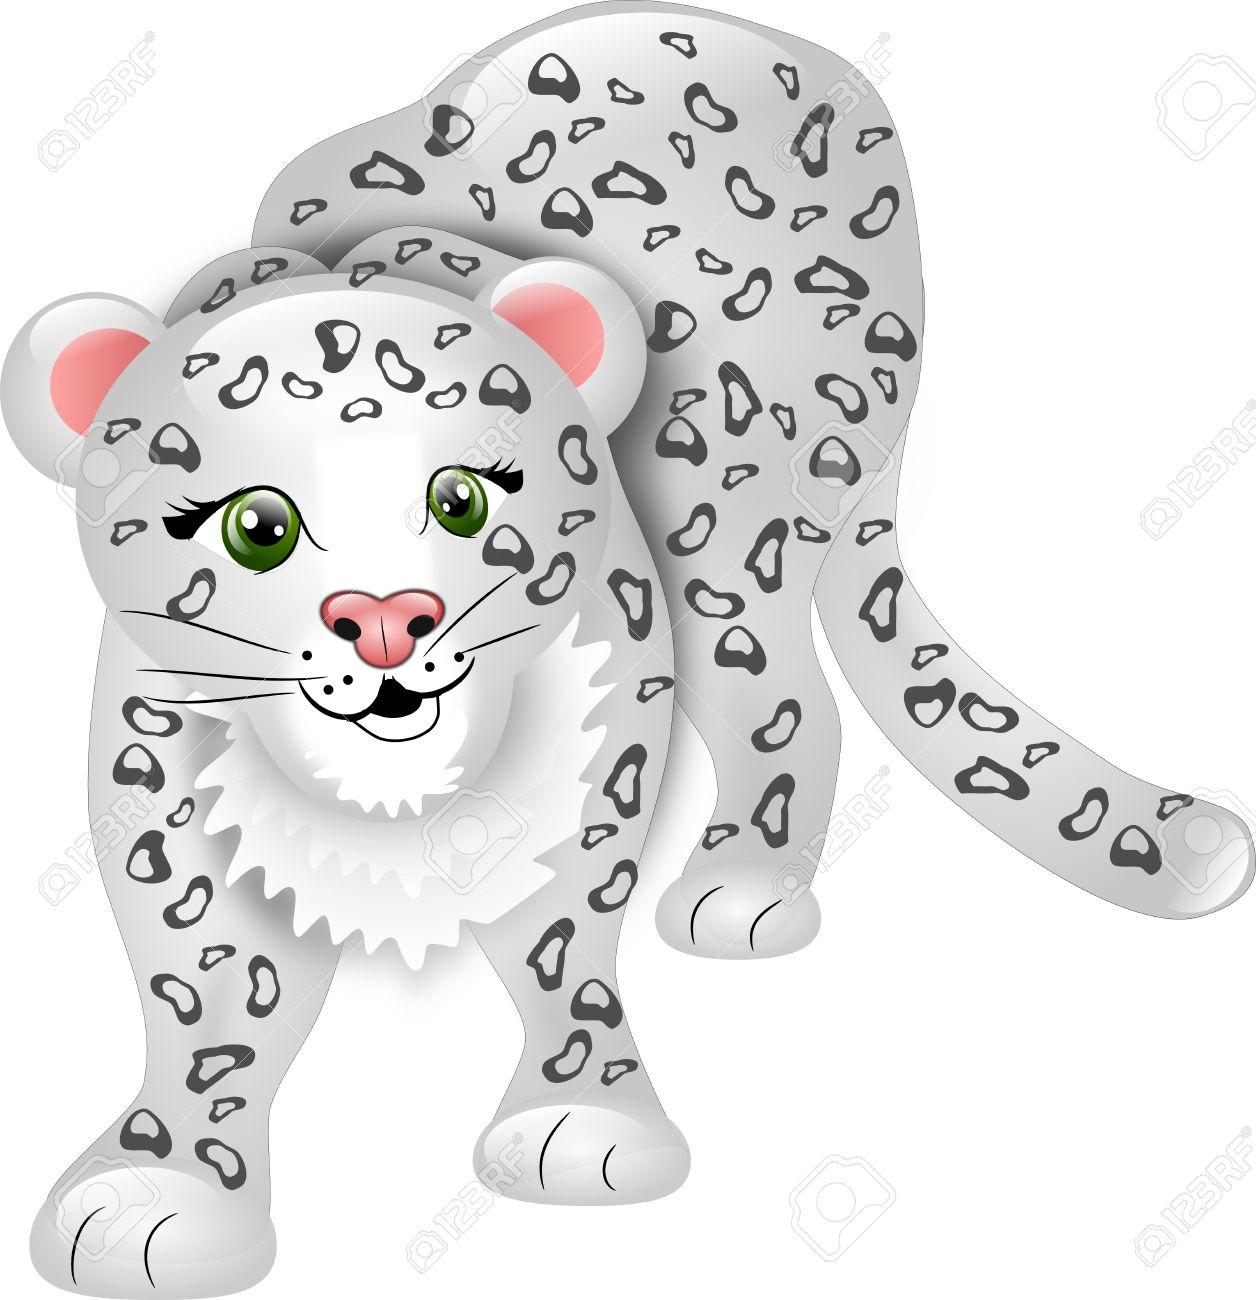 Mac snow leopard disc